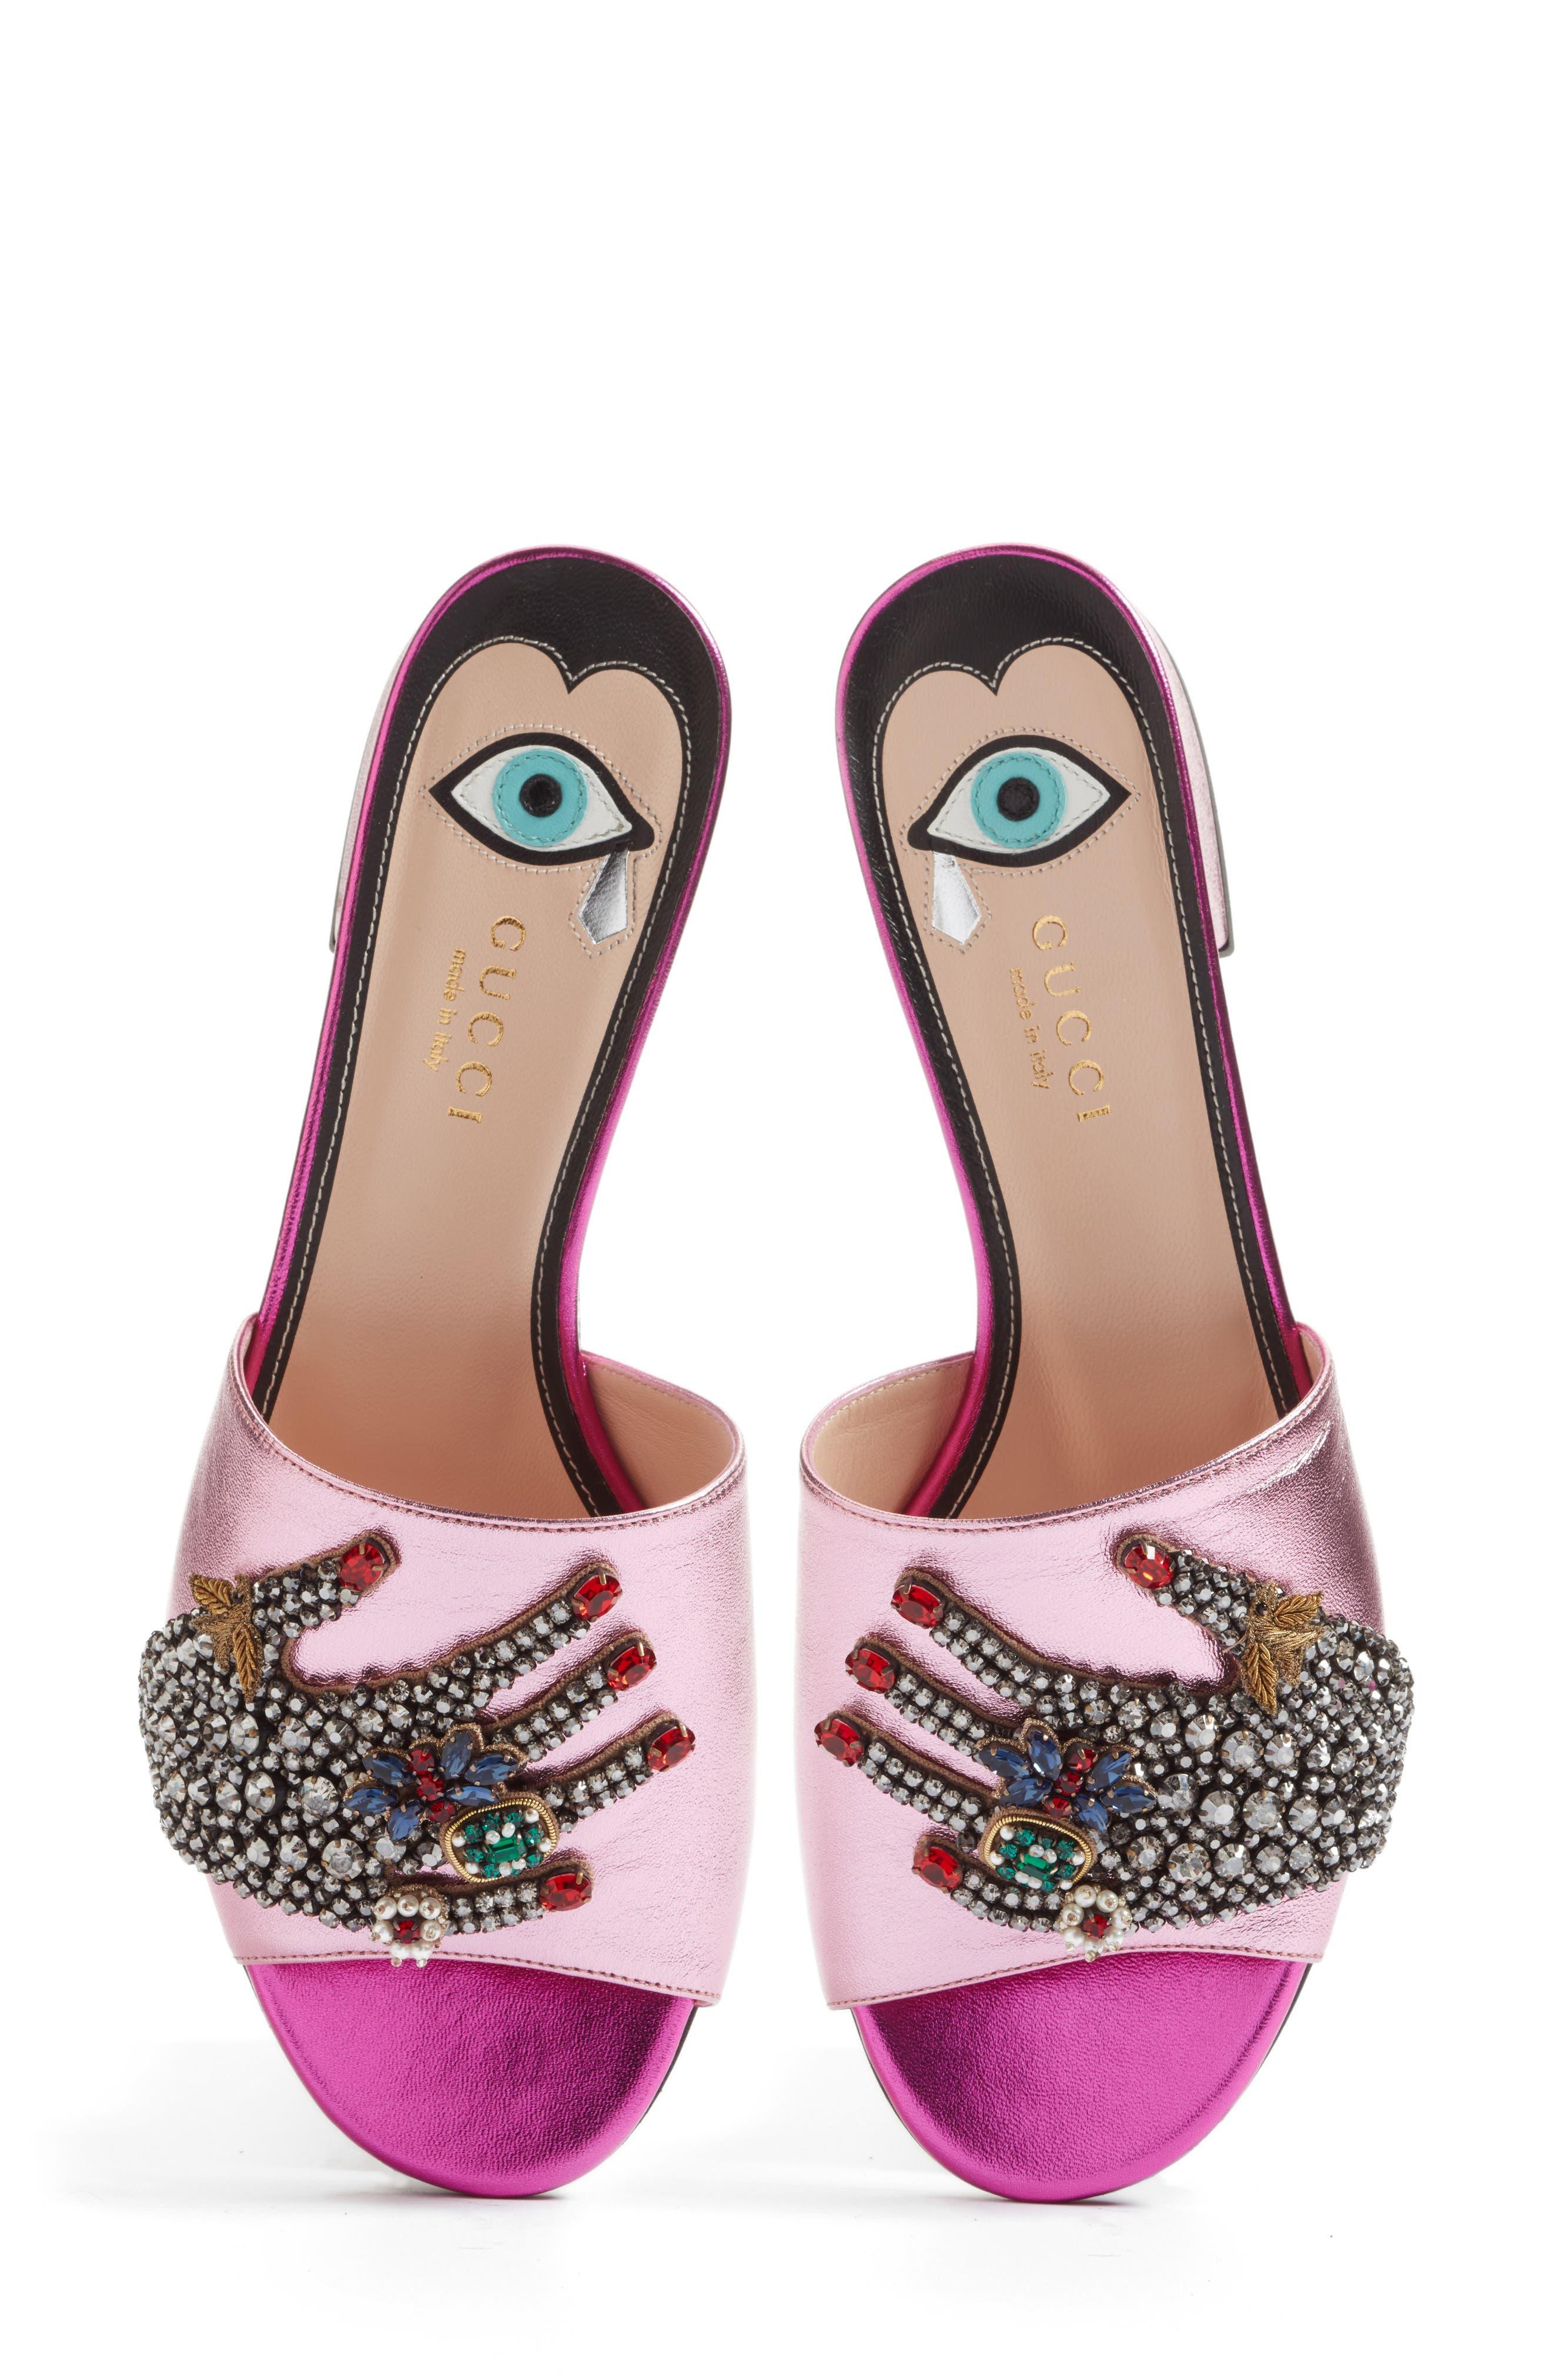 Main Image - Gucci Wangy Embellished Slide Sandal